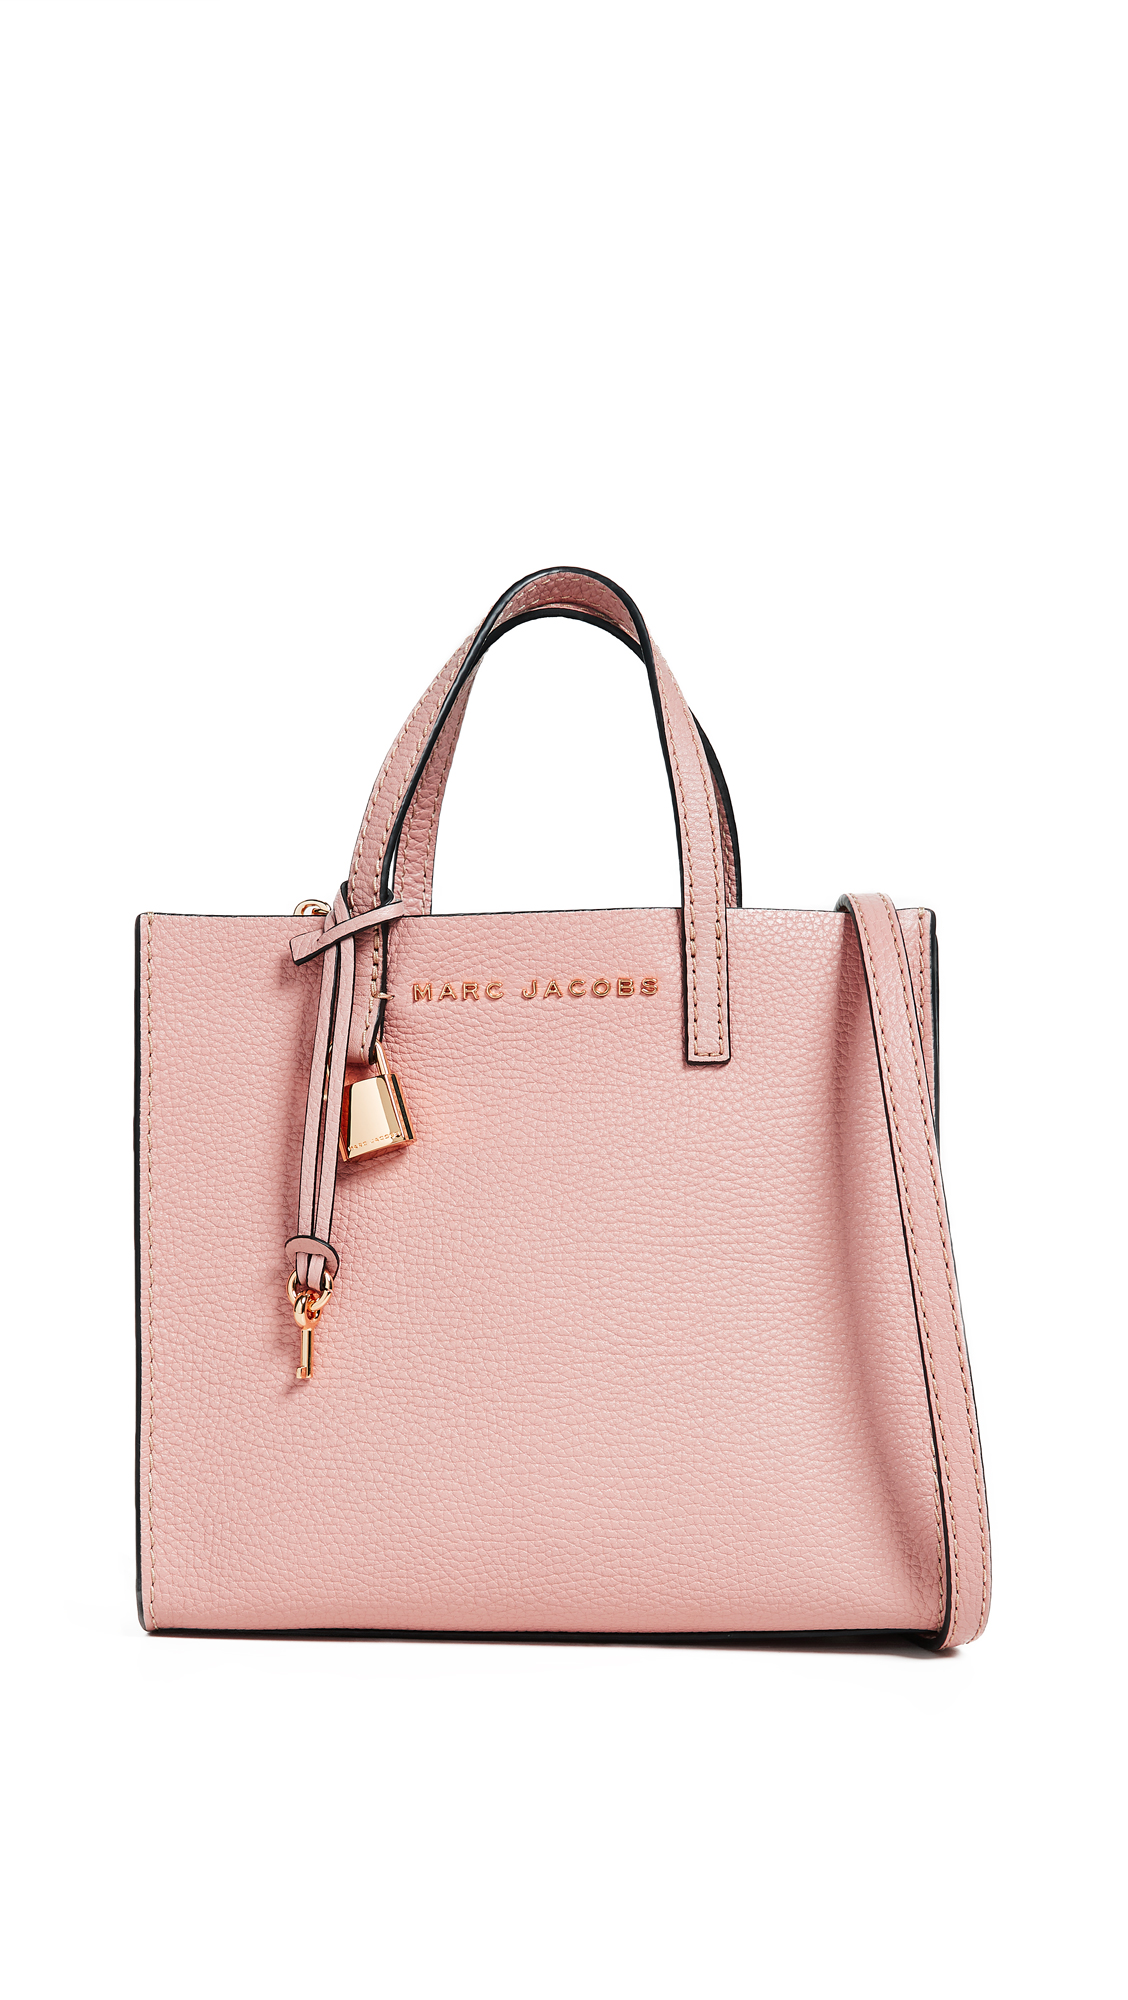 b968f6c115f7 Marc Jacobs Mini Grind Tote Bag